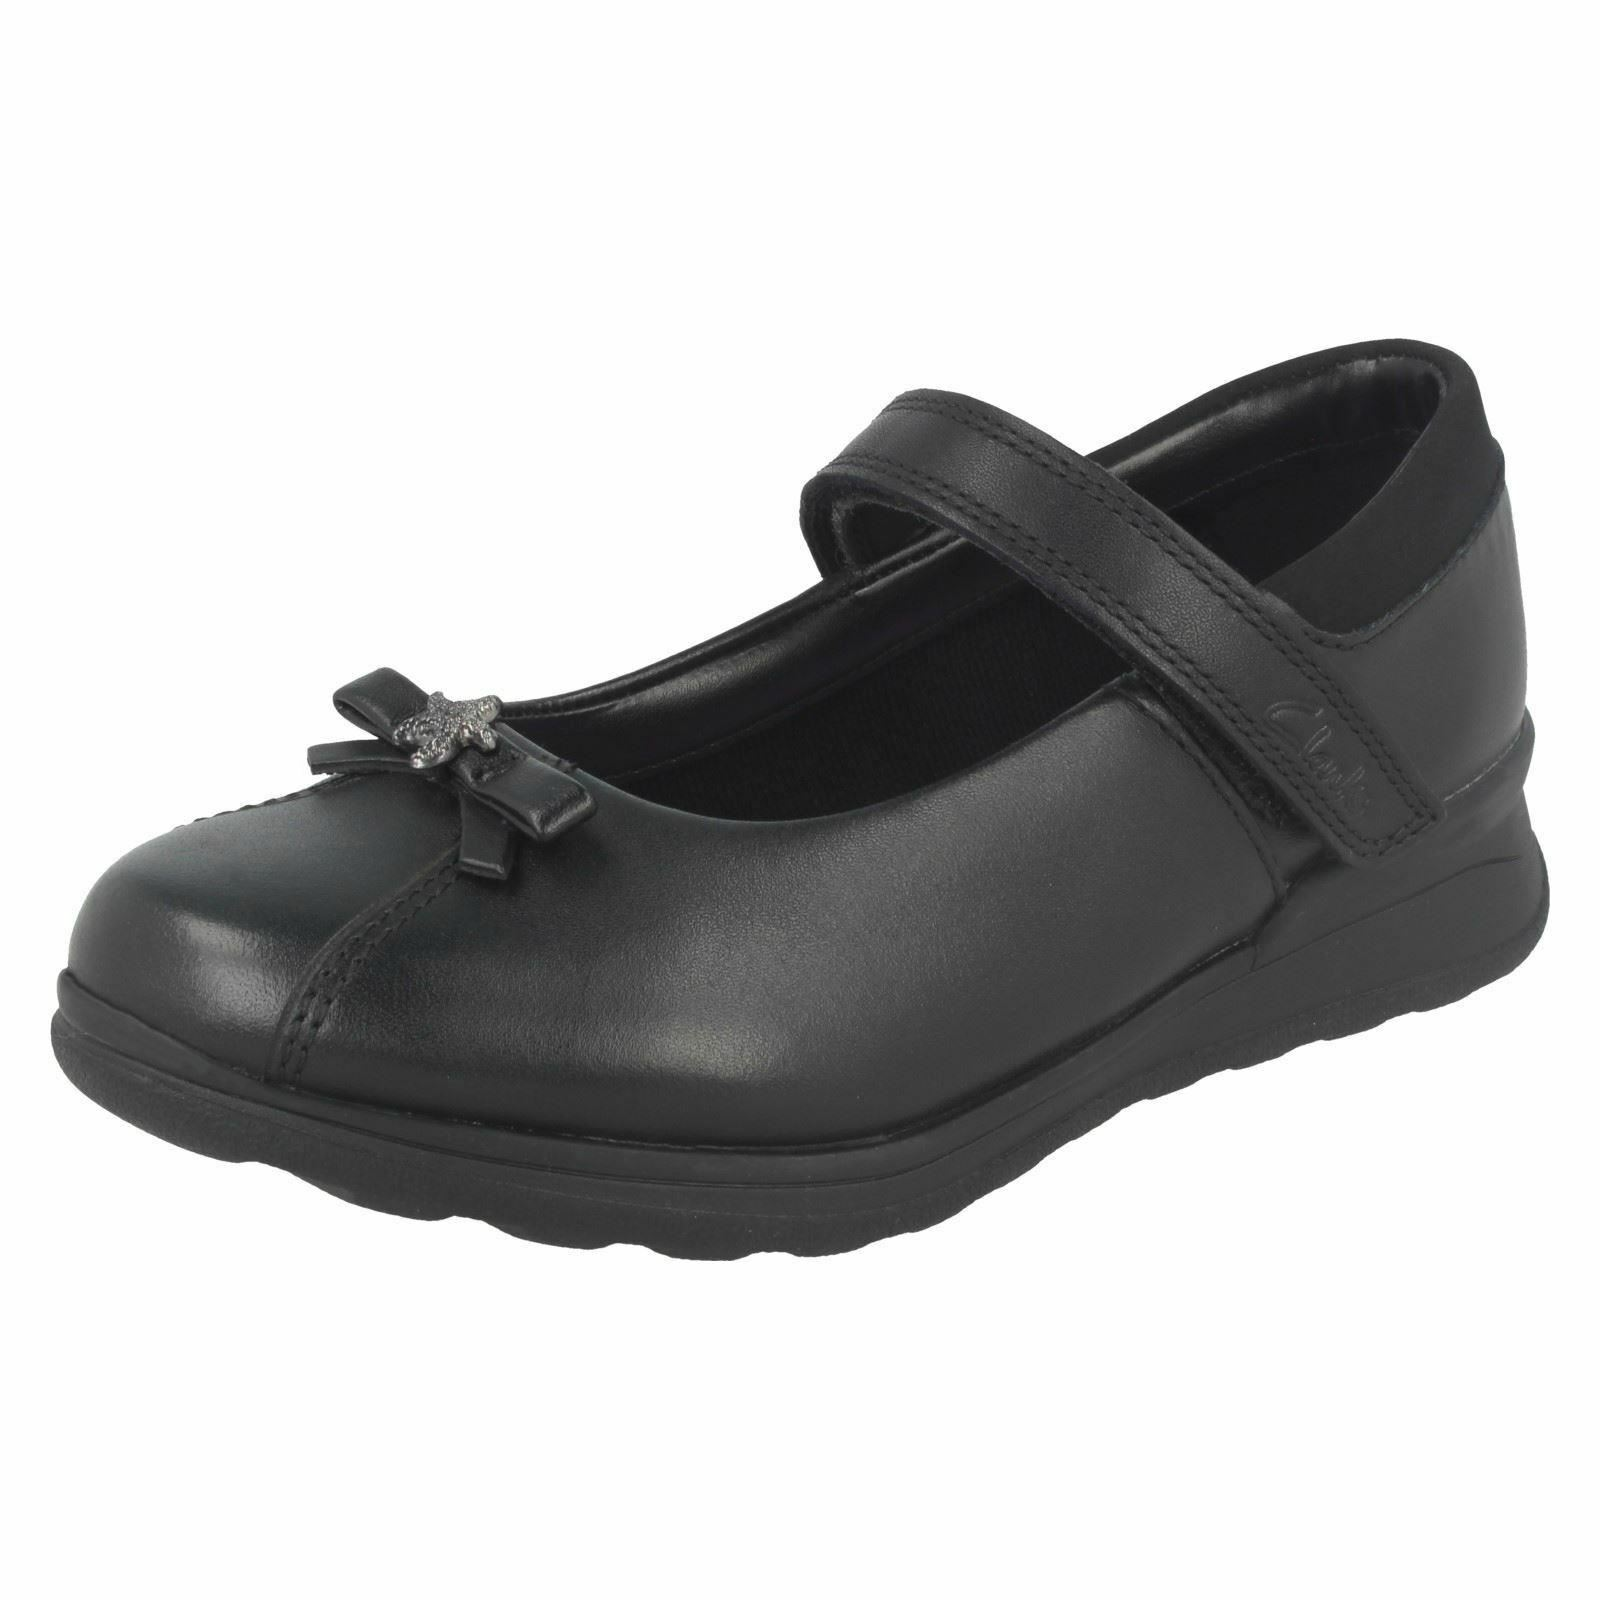 Clarks 'Mariel Wish' Girls Black Extra Wide H Fit School Sho